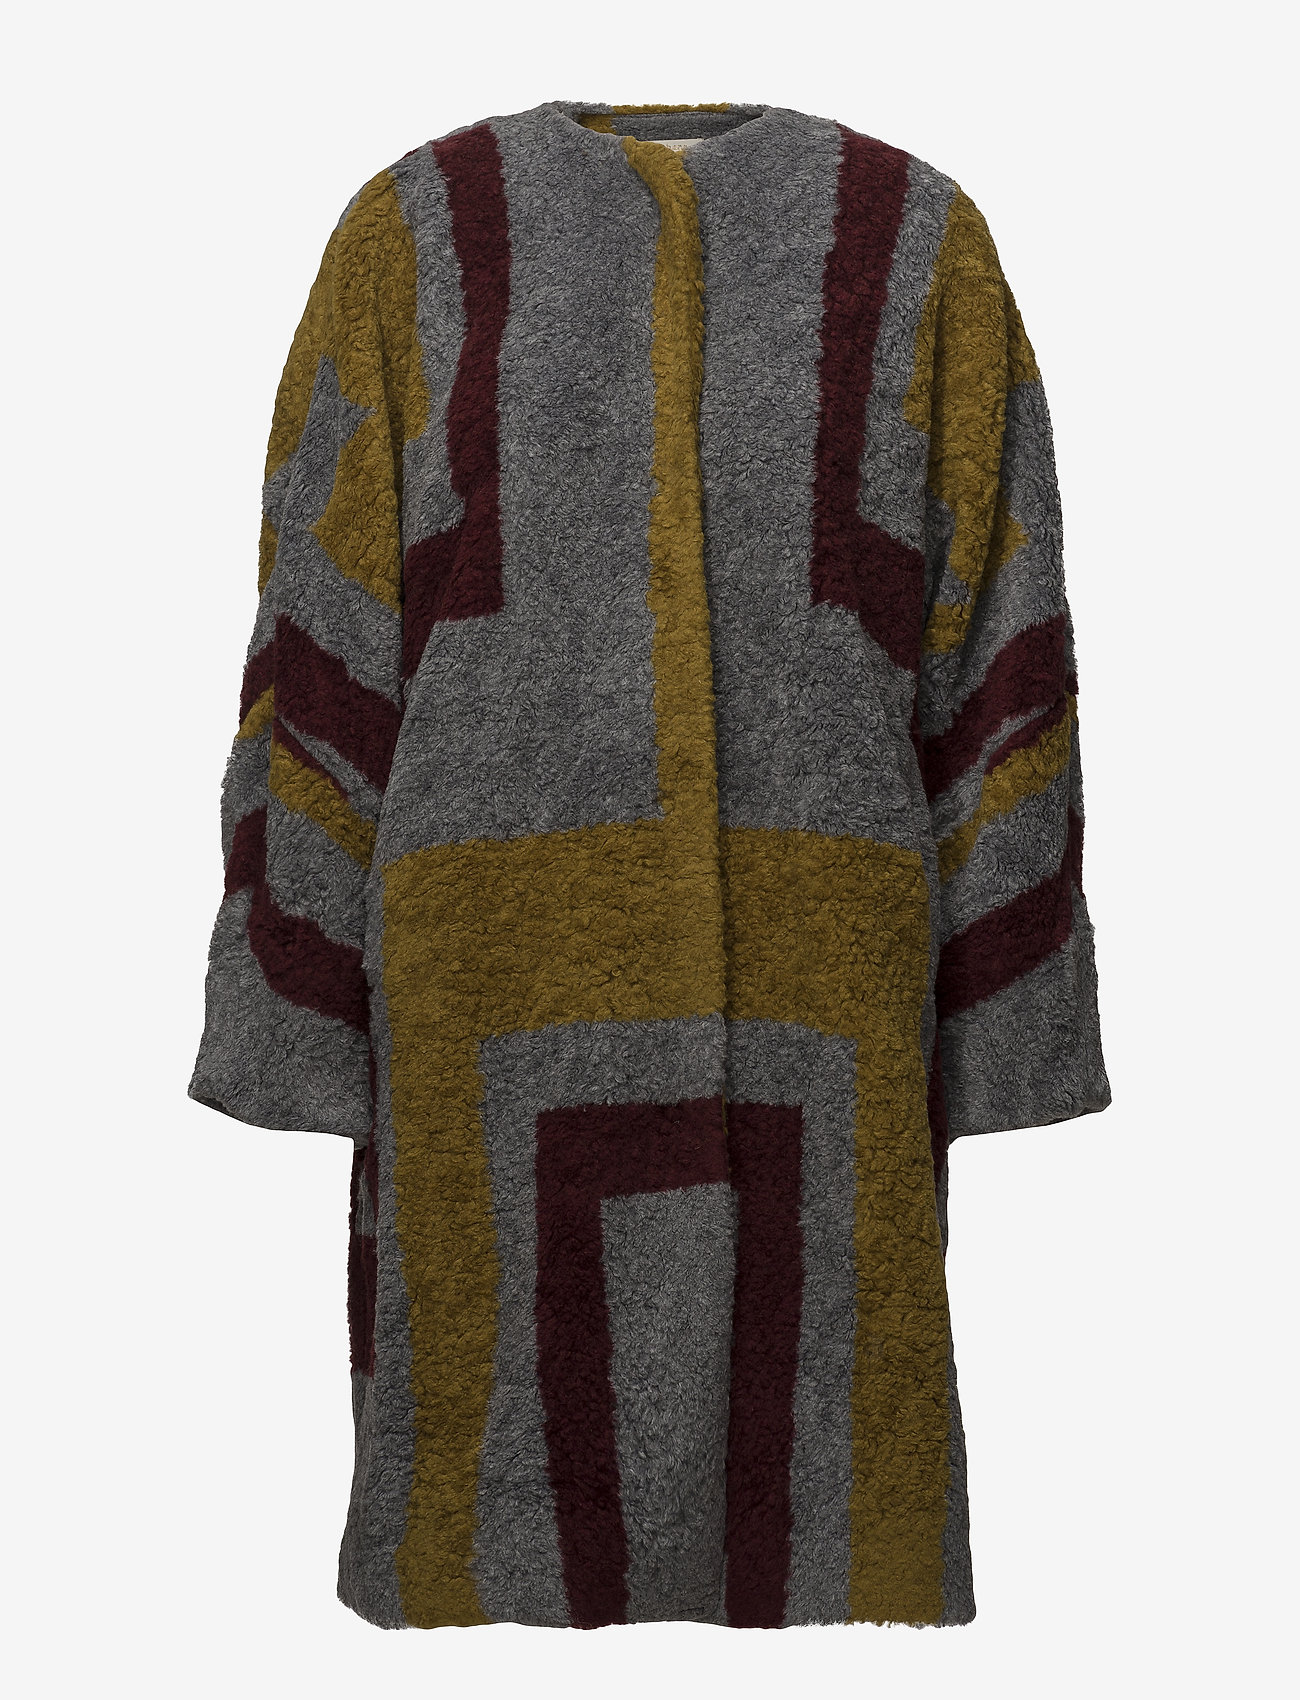 Rabens Saloner - Tribal knit coat - wollen jassen - bordeaux - 0